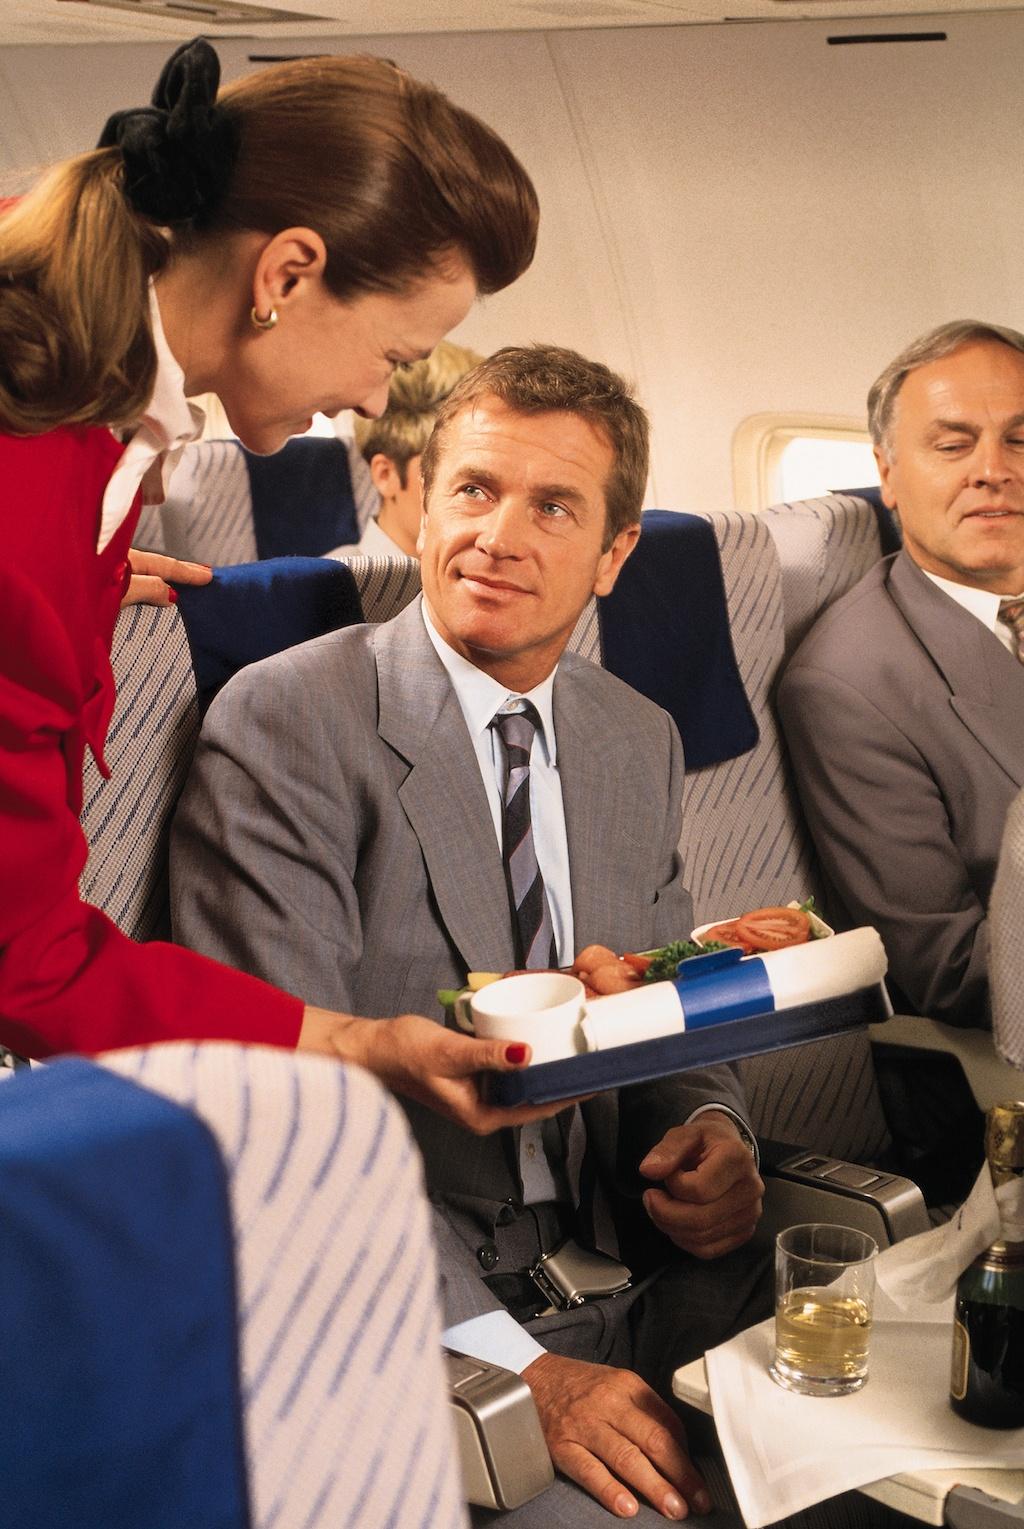 Flight attendant helping businessman on airplane